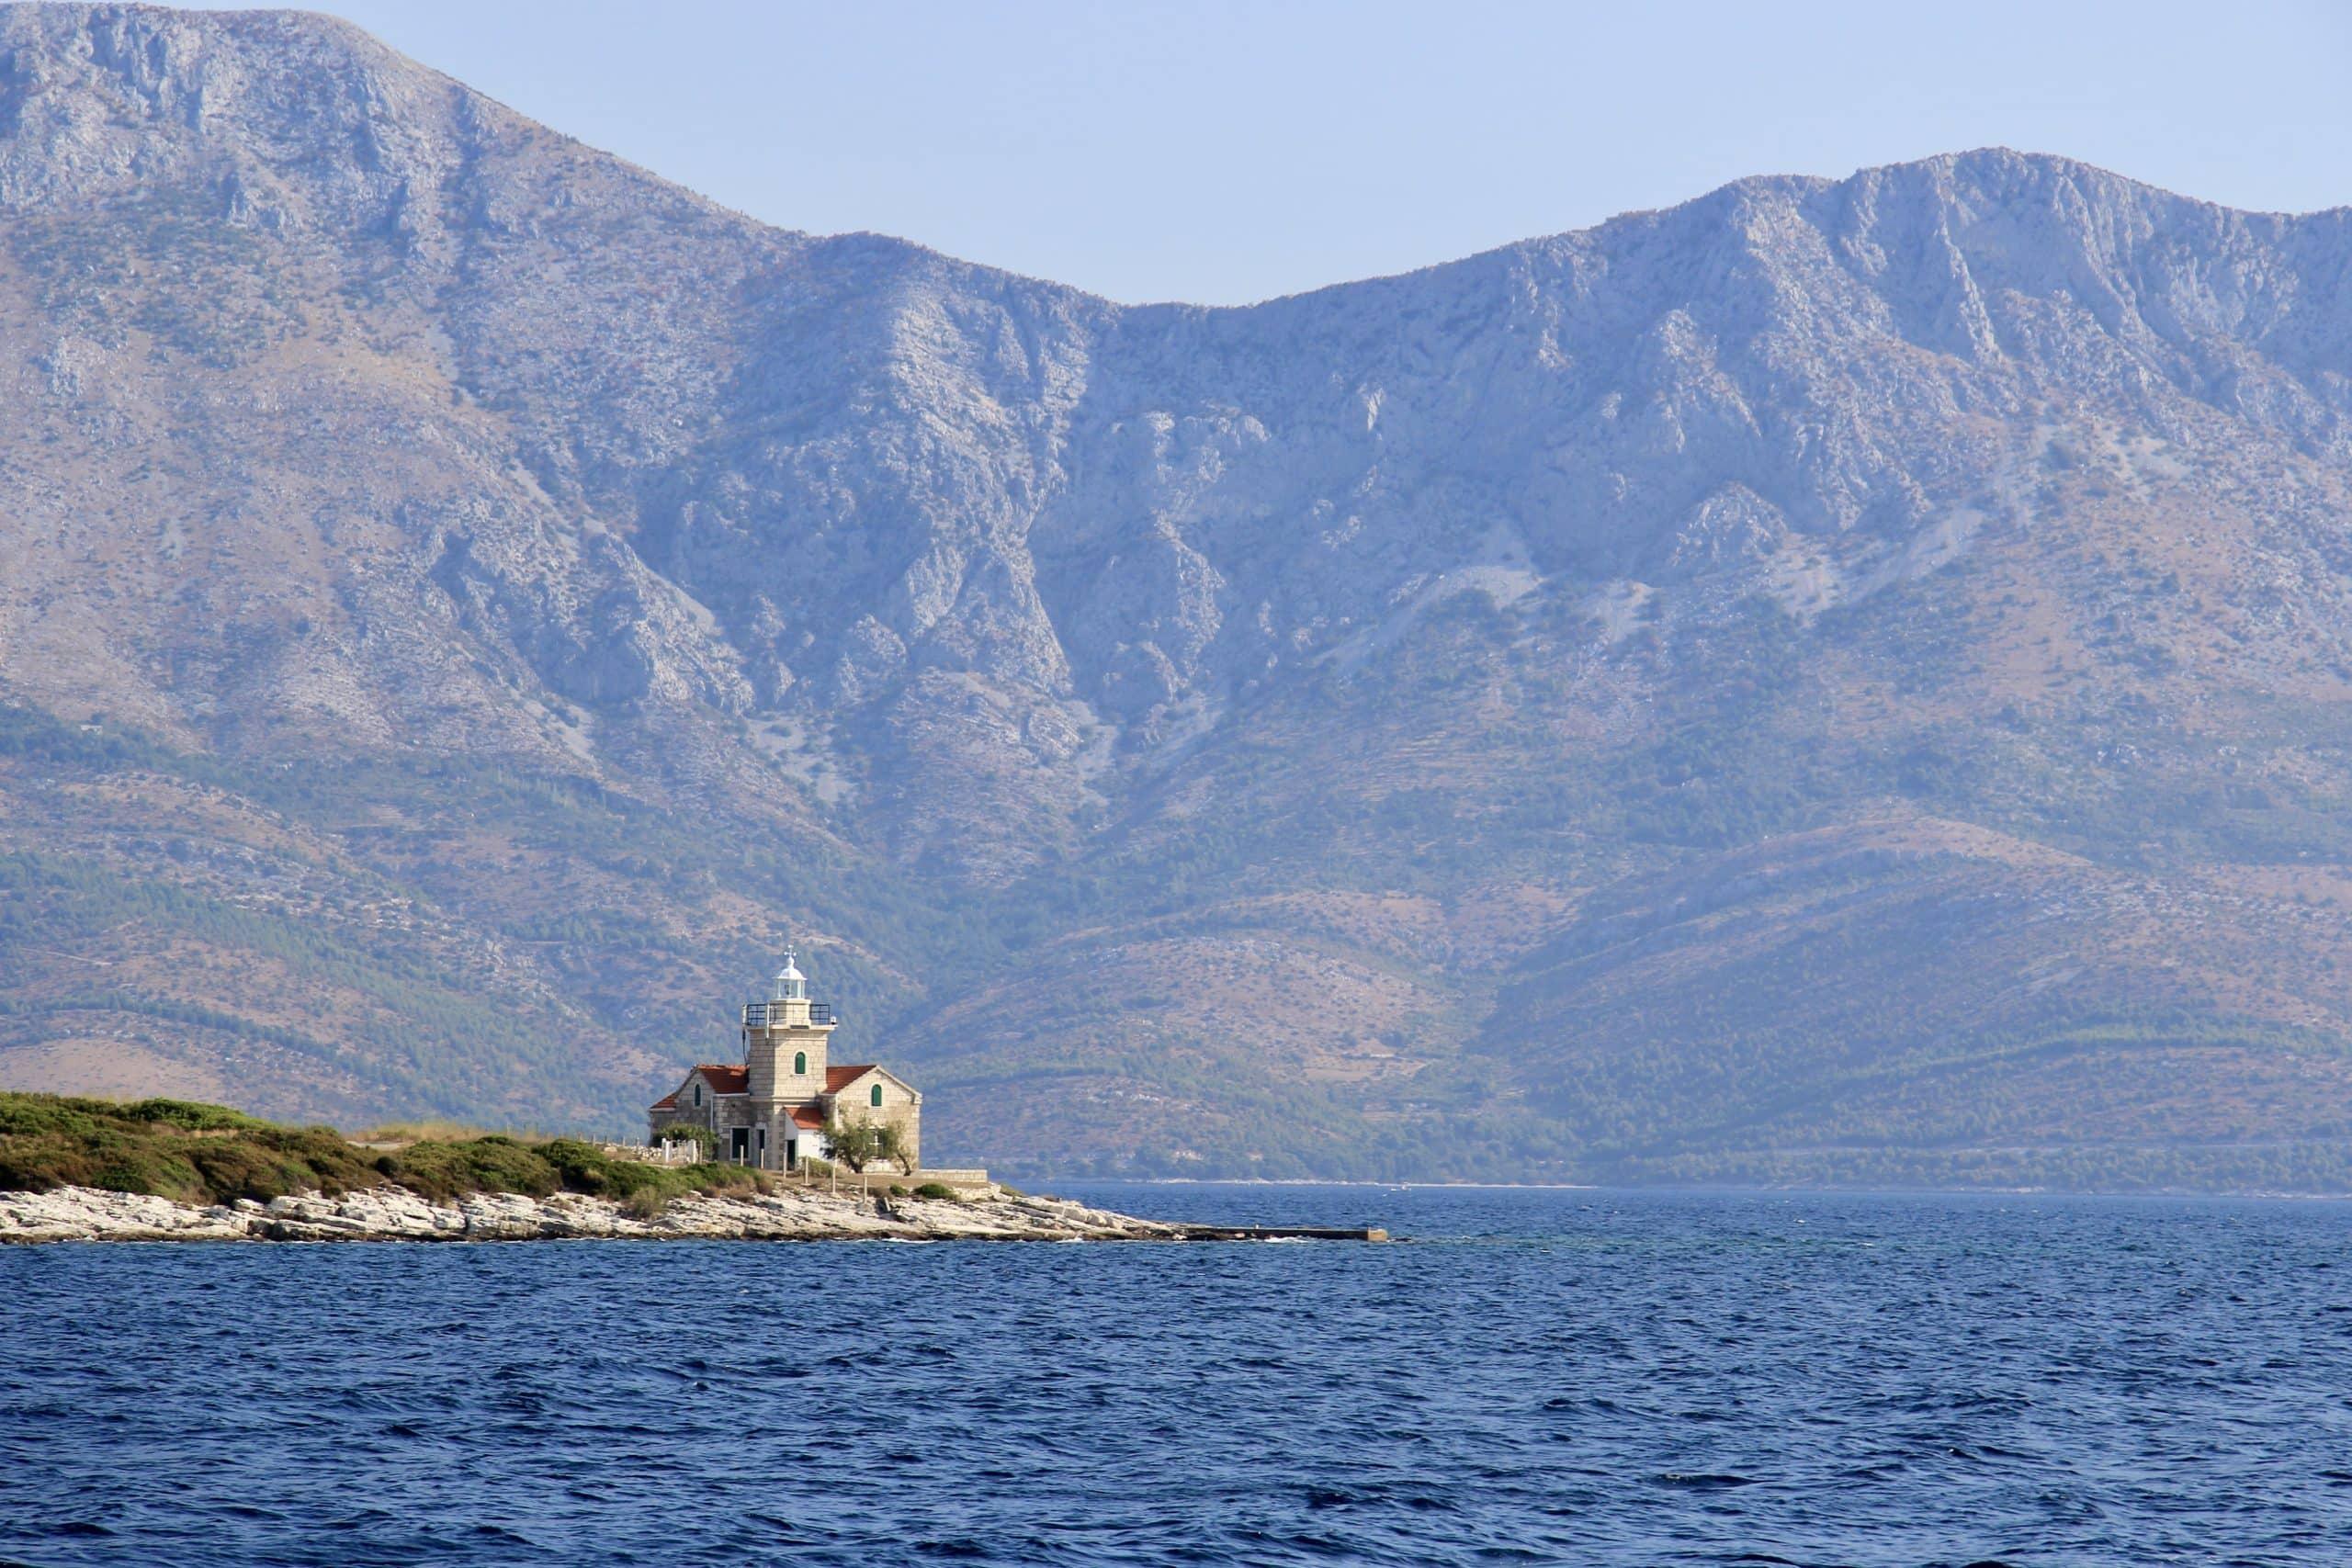 Sućuraj lighthouse on Hvar Island seen whilst sailing in t he Dalmatian Coast of Croatia